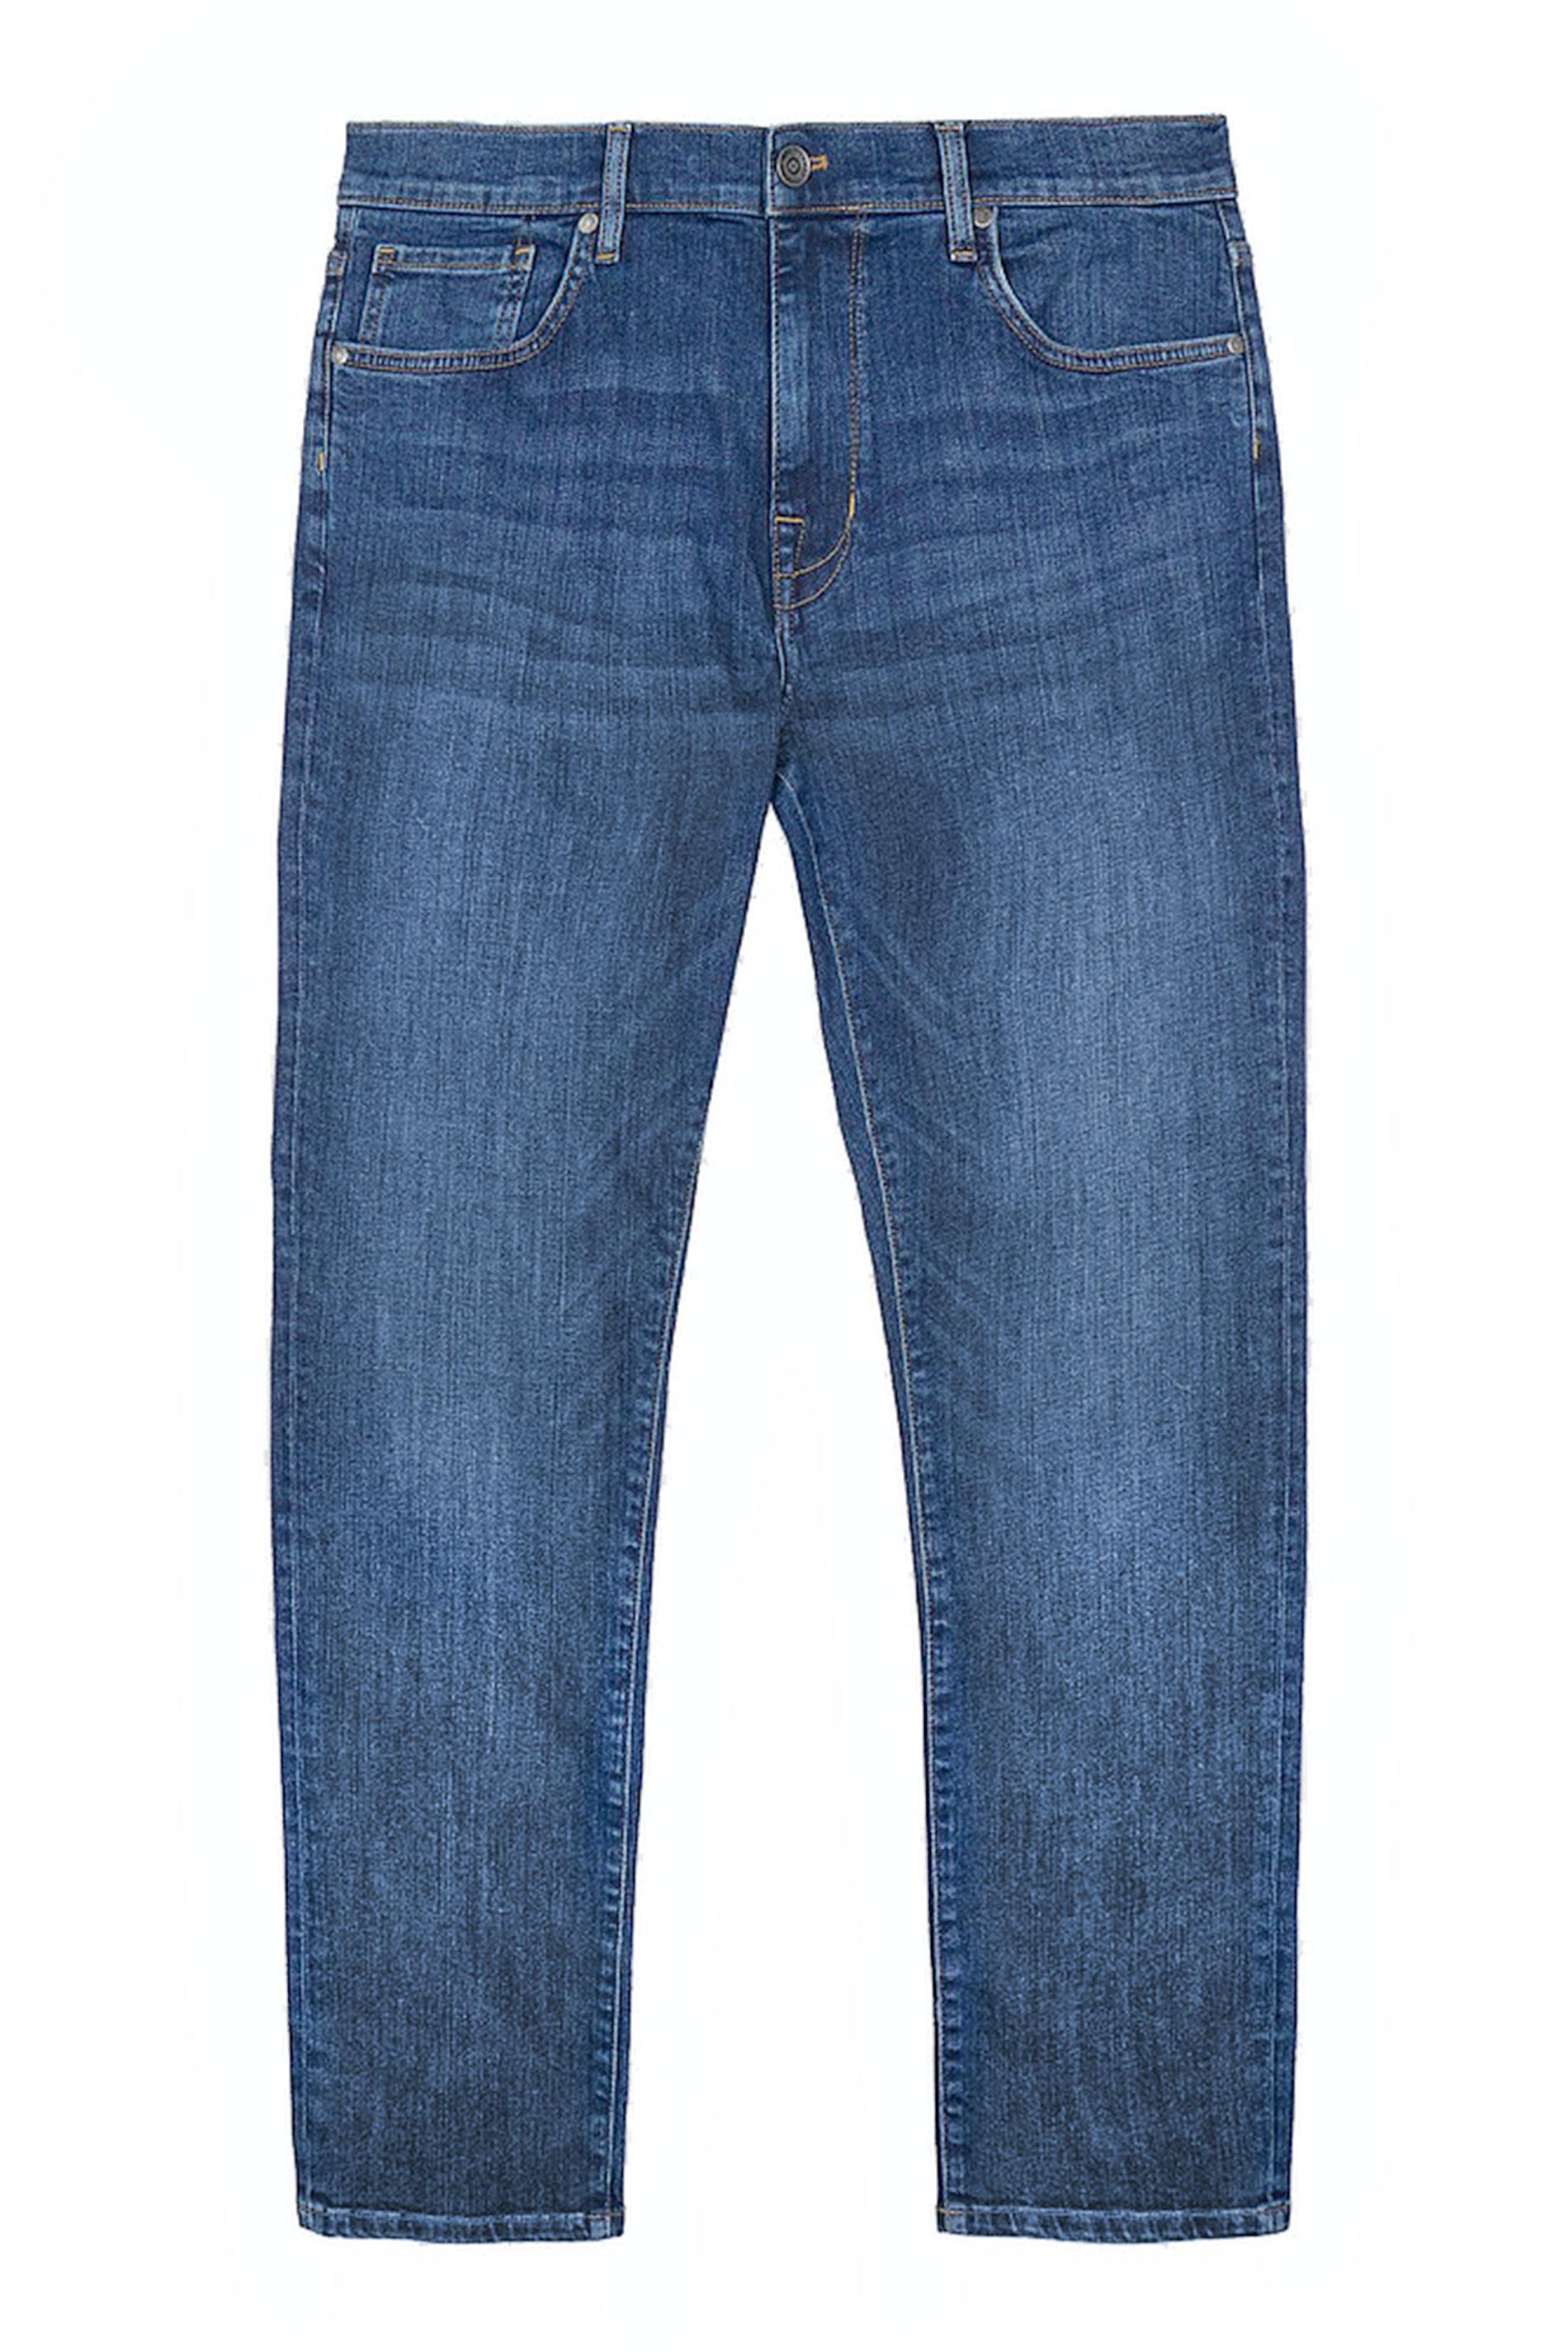 BEN SHERMAN Blue Straight Leg Denim Jeans